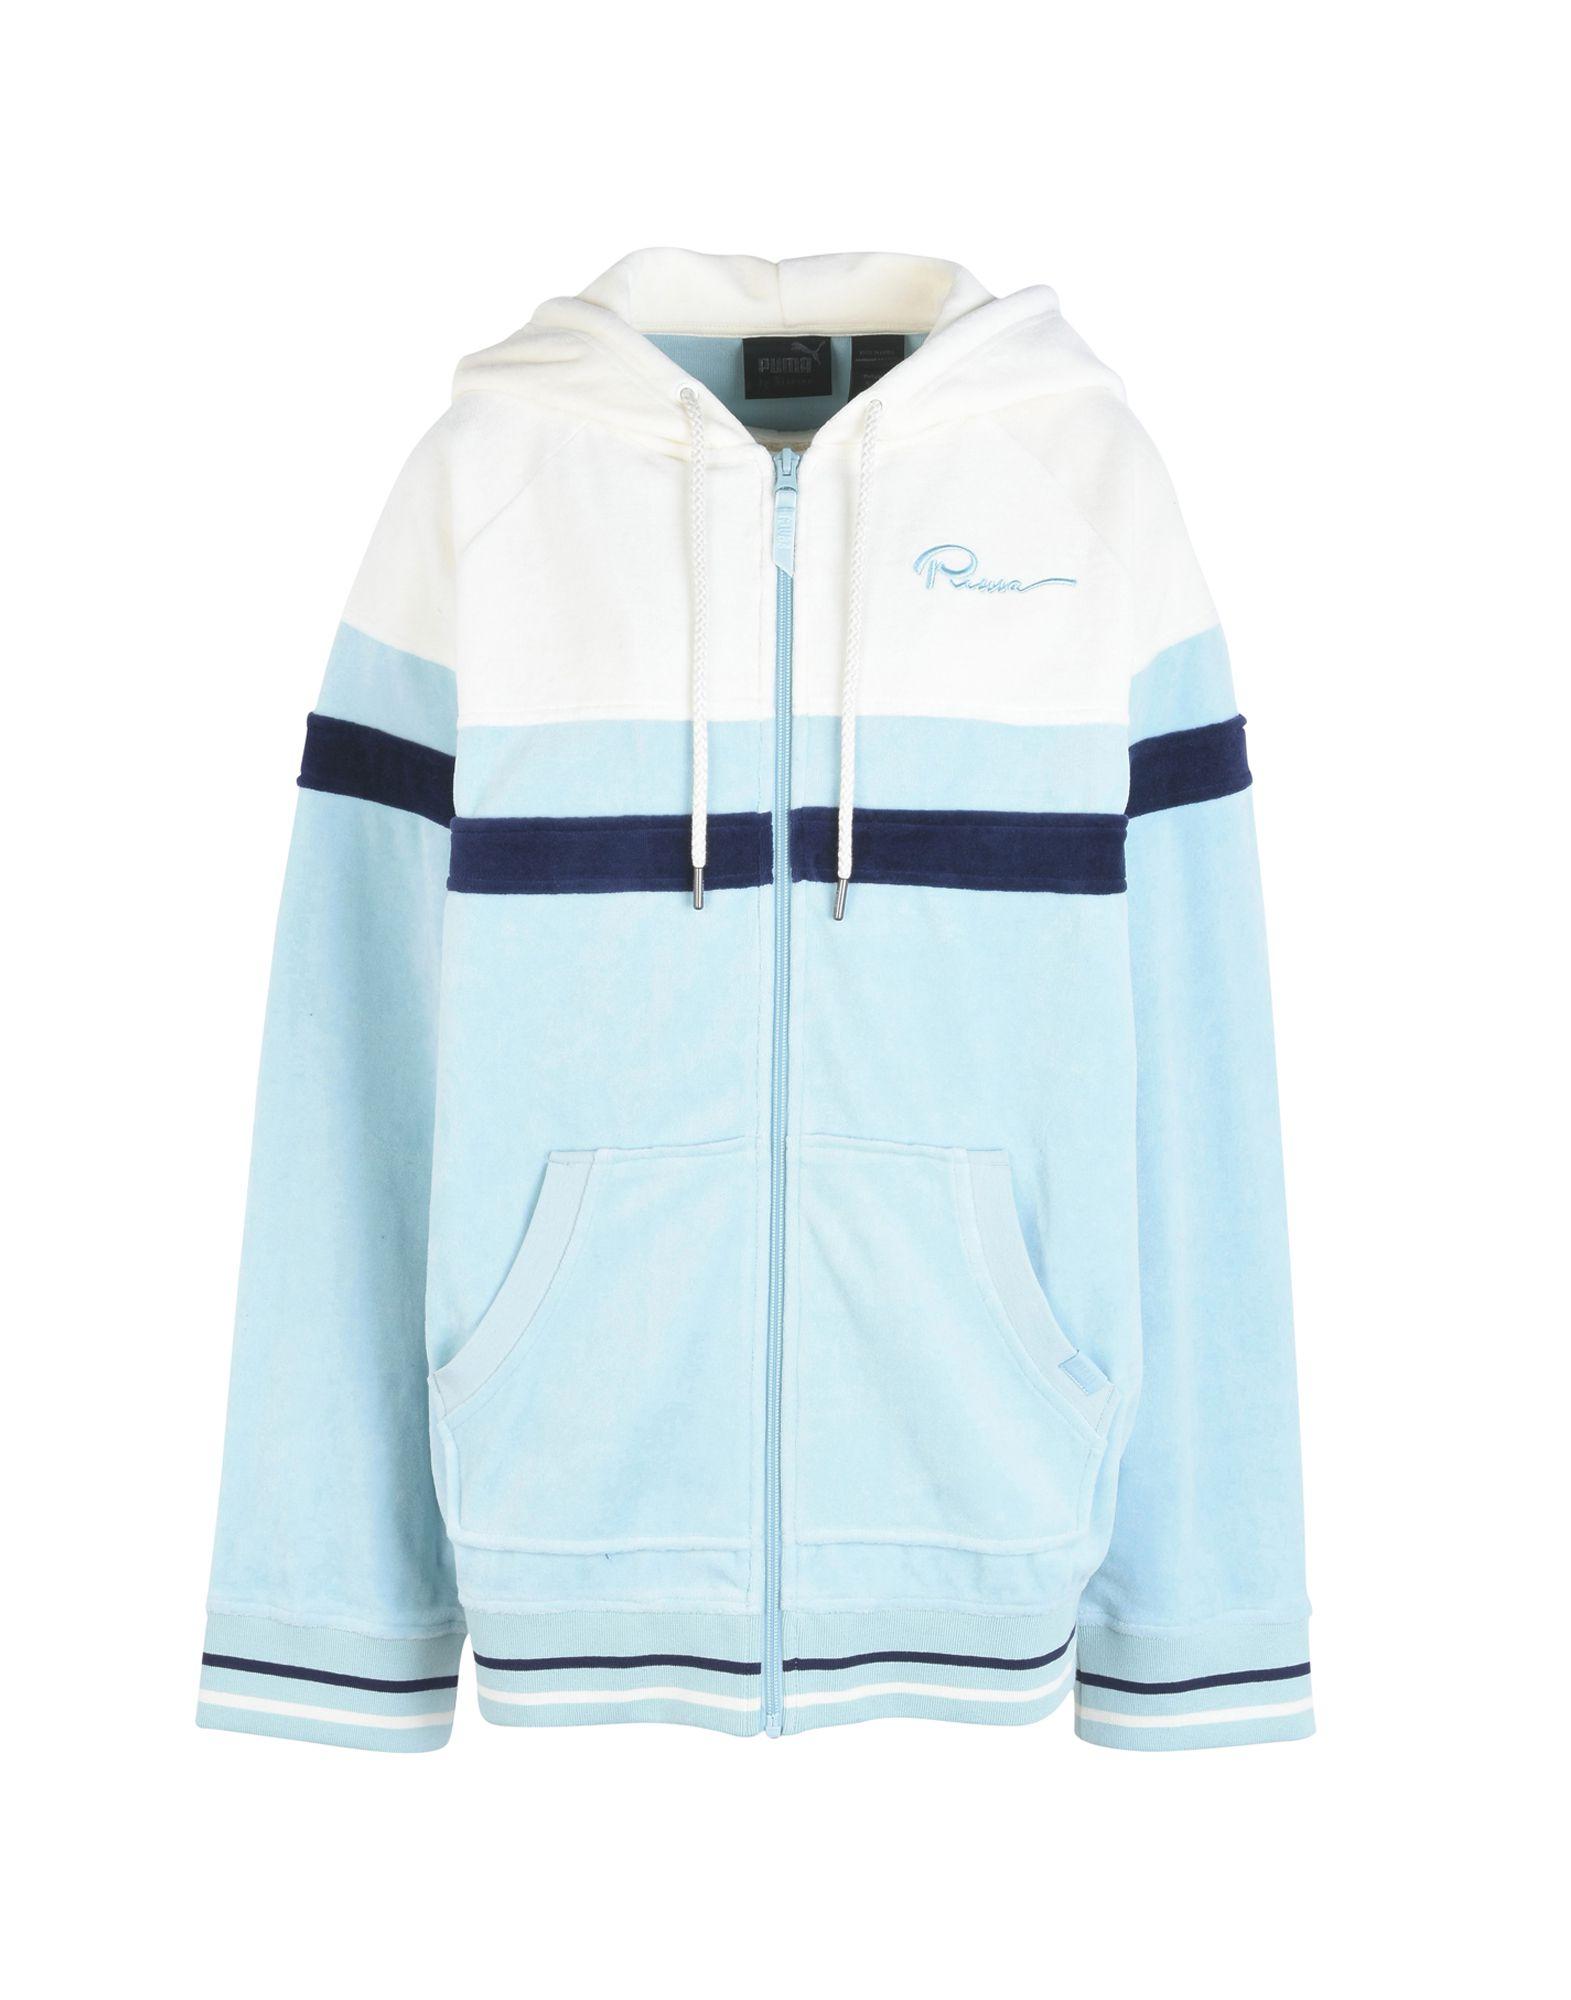 560b07096215 Fenty Puma By Rihanna women s sweatshirts   hoodies with or without zip